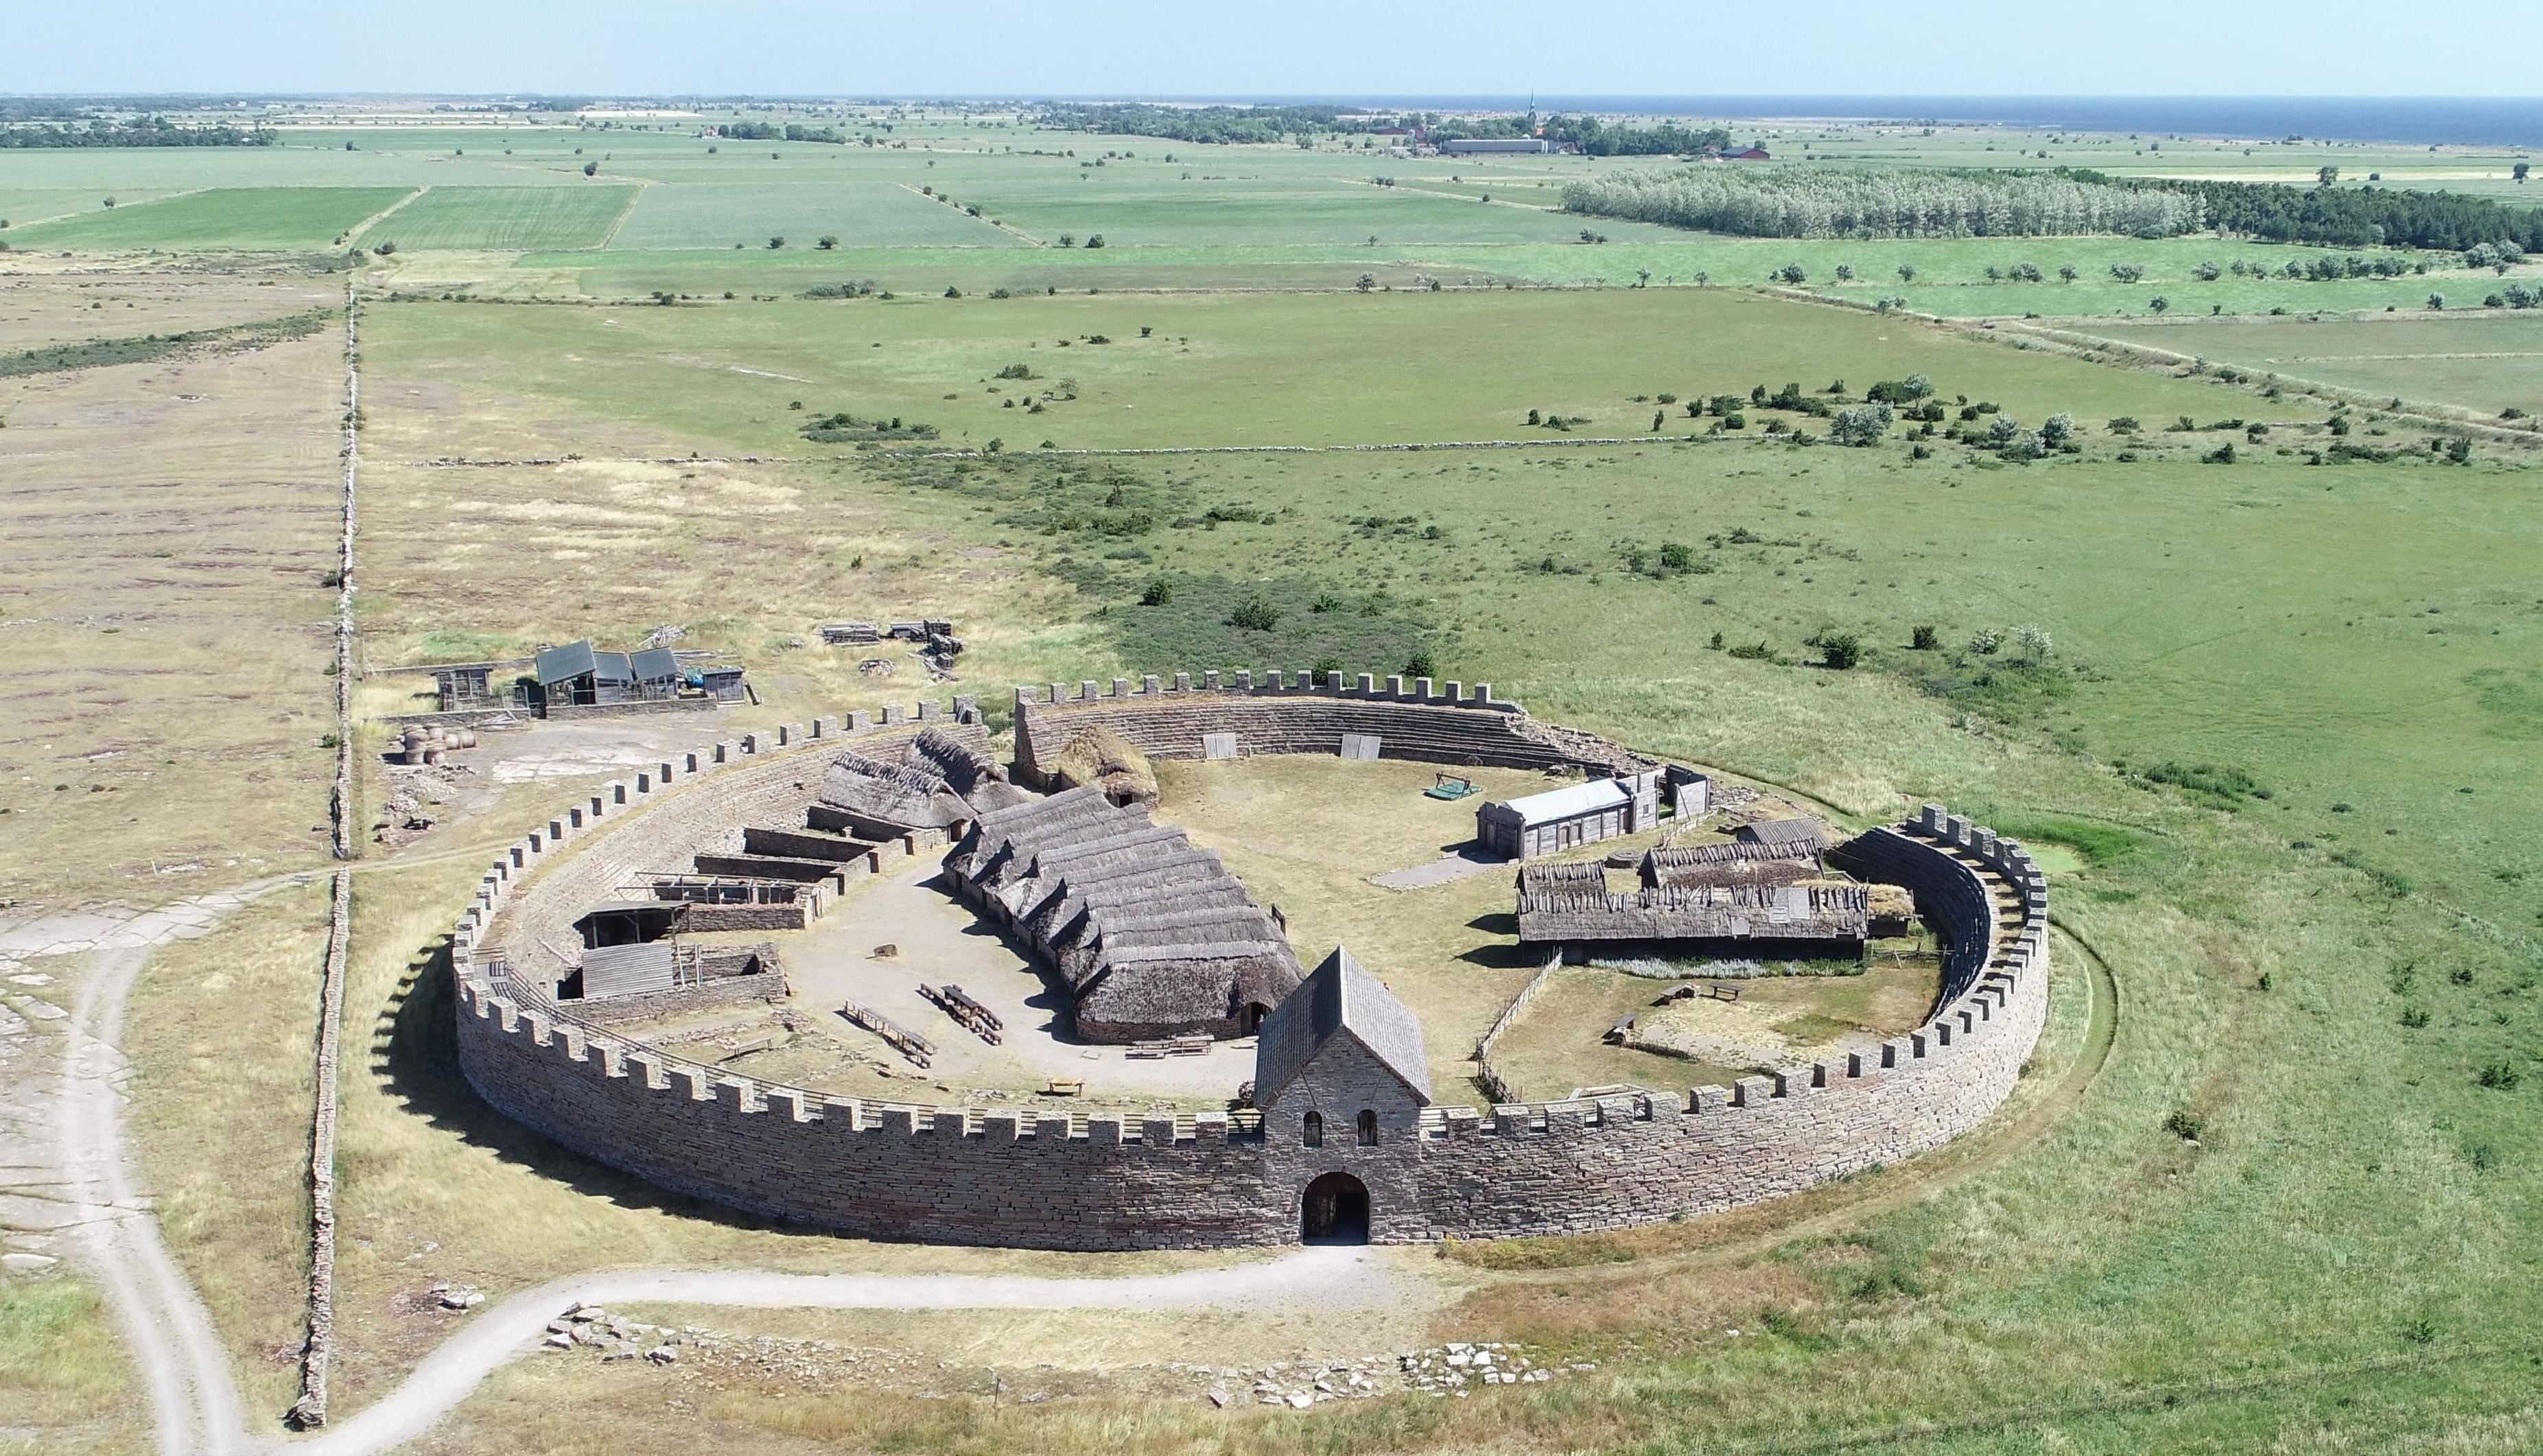 Eketorp fortress